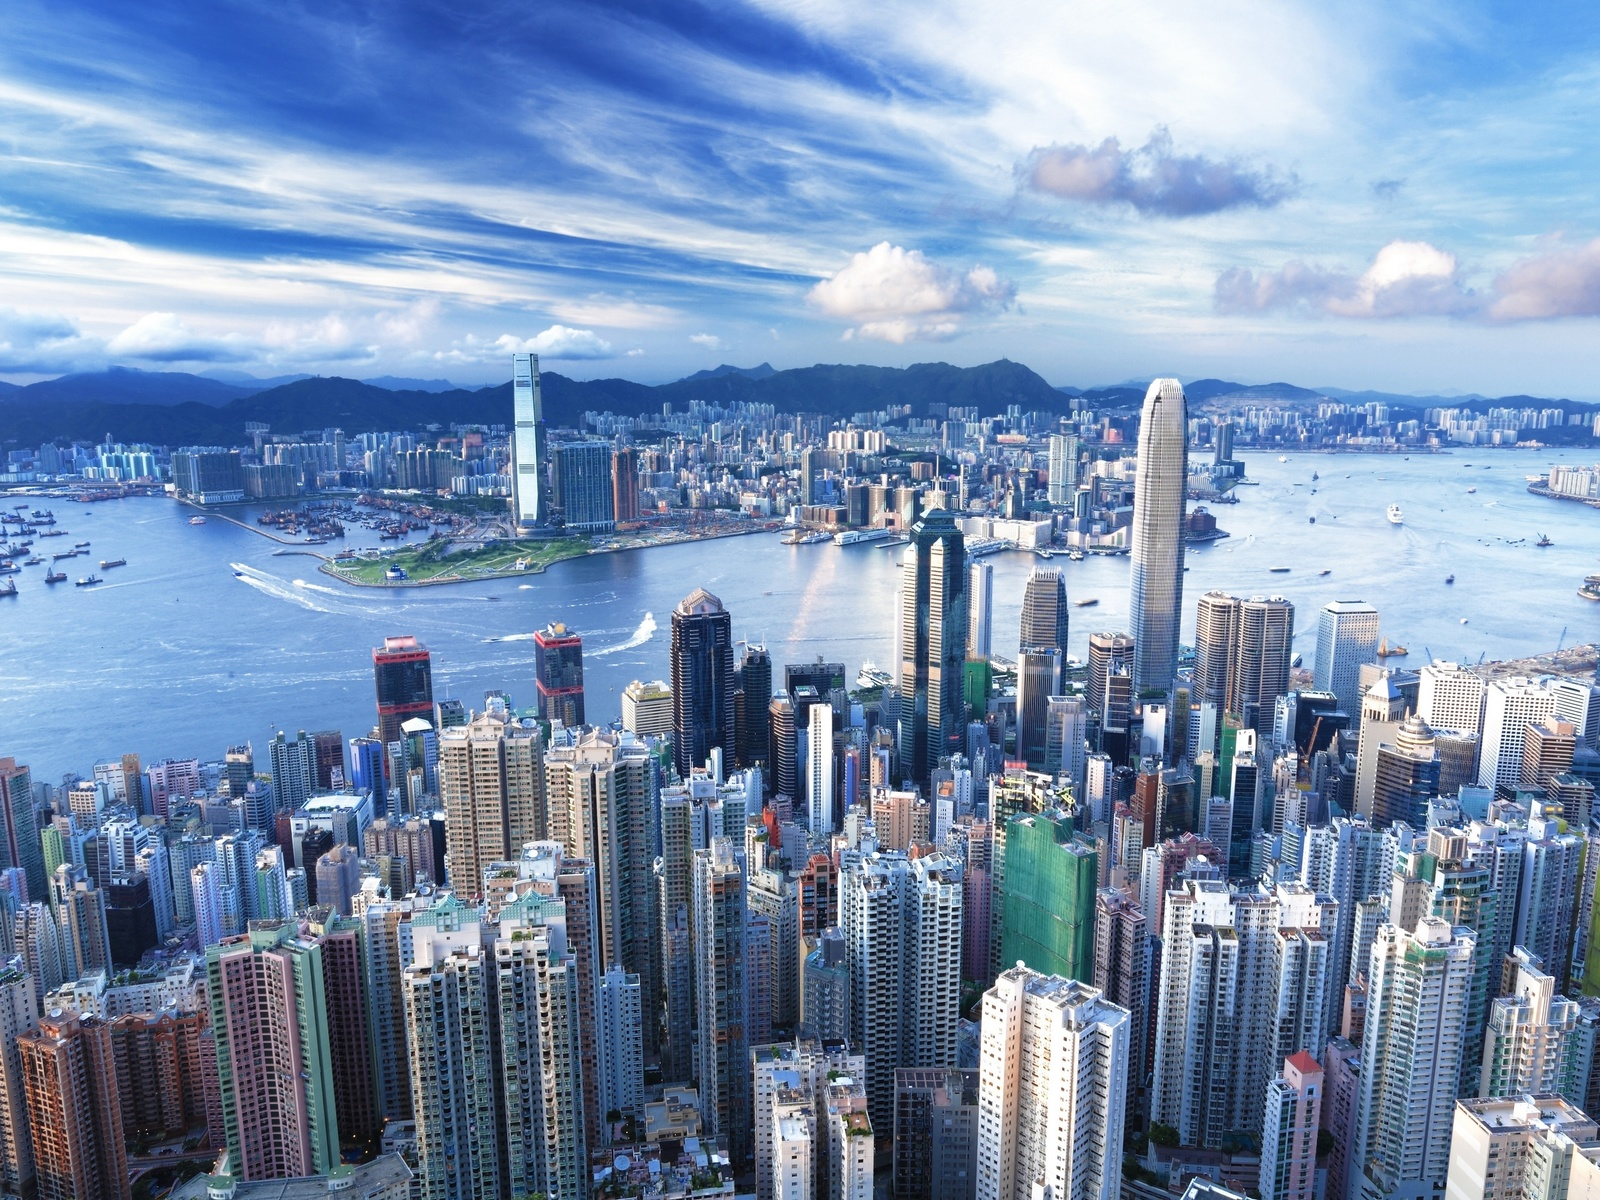 дома, небоскребы, облака, здания, china